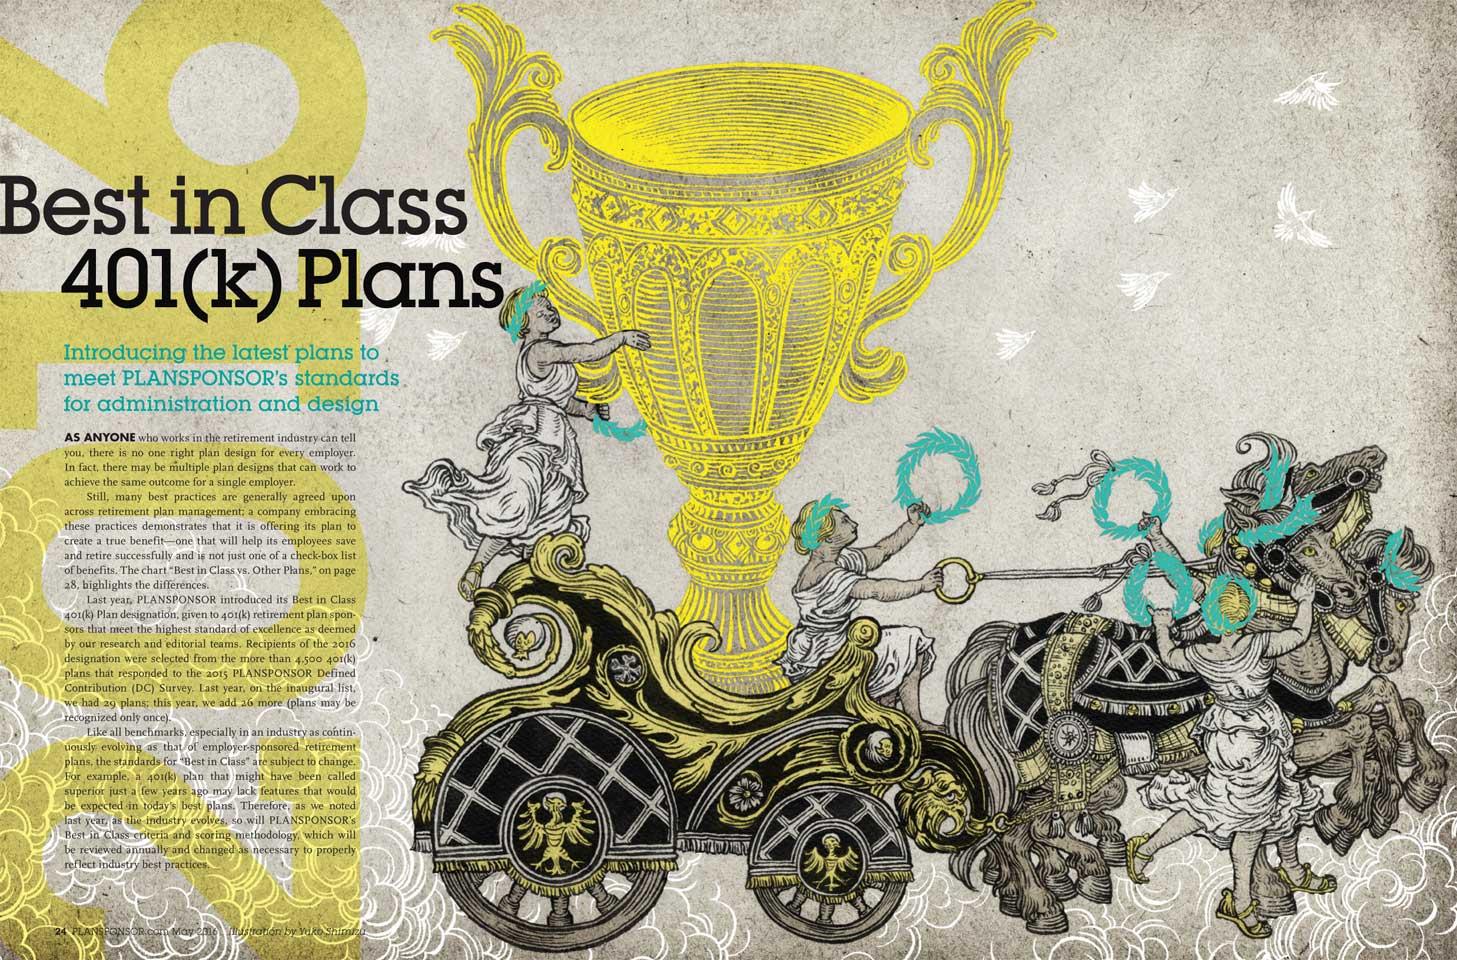 Yuko Shimizu - PLANSPONSOR cover Best in Class 401(k) Plans -